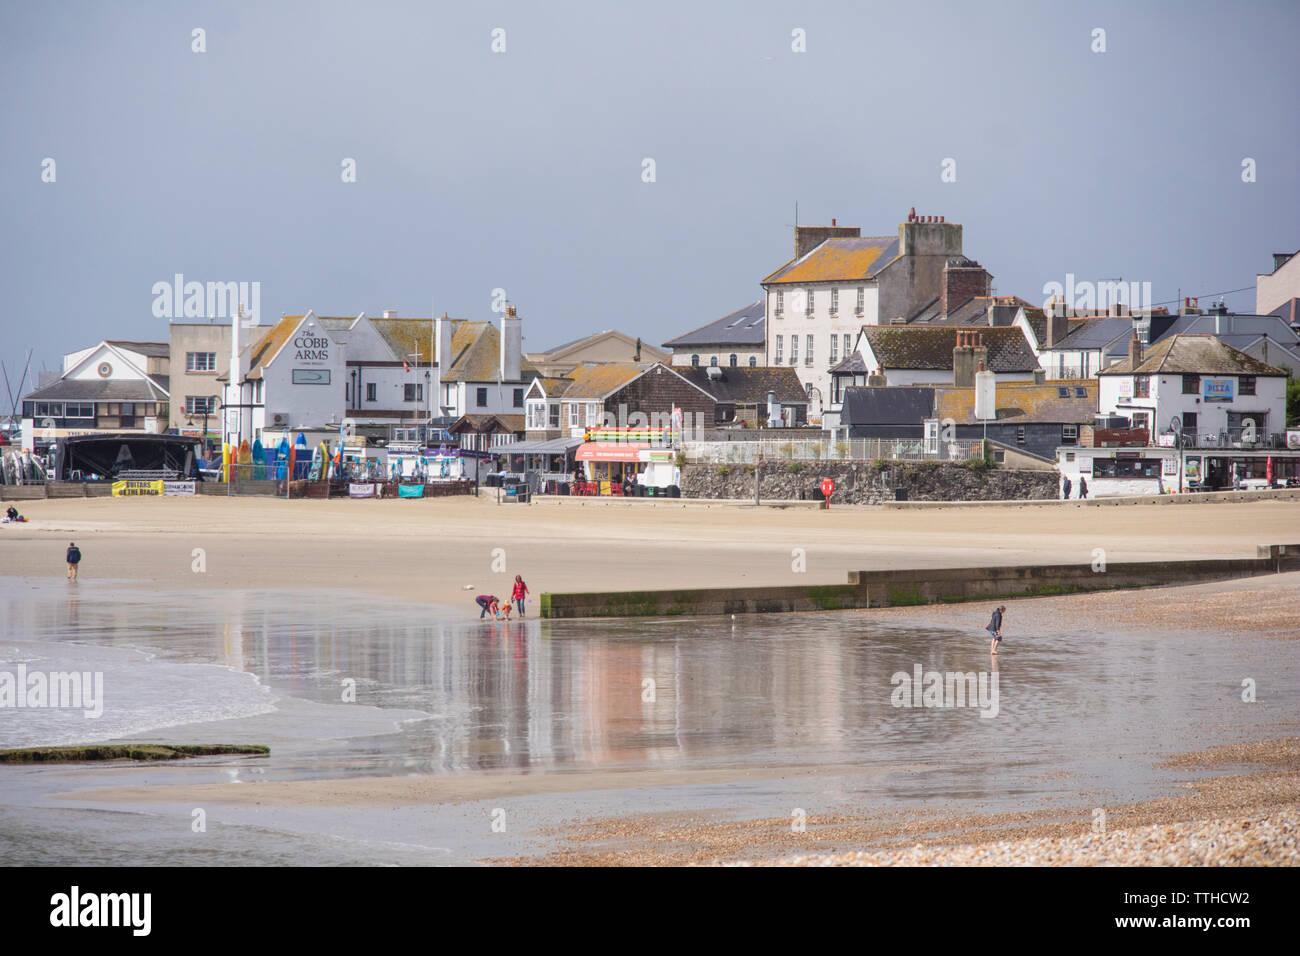 Sandy beaches at Lyme Regis, Dorset, England, UK - Stock Image